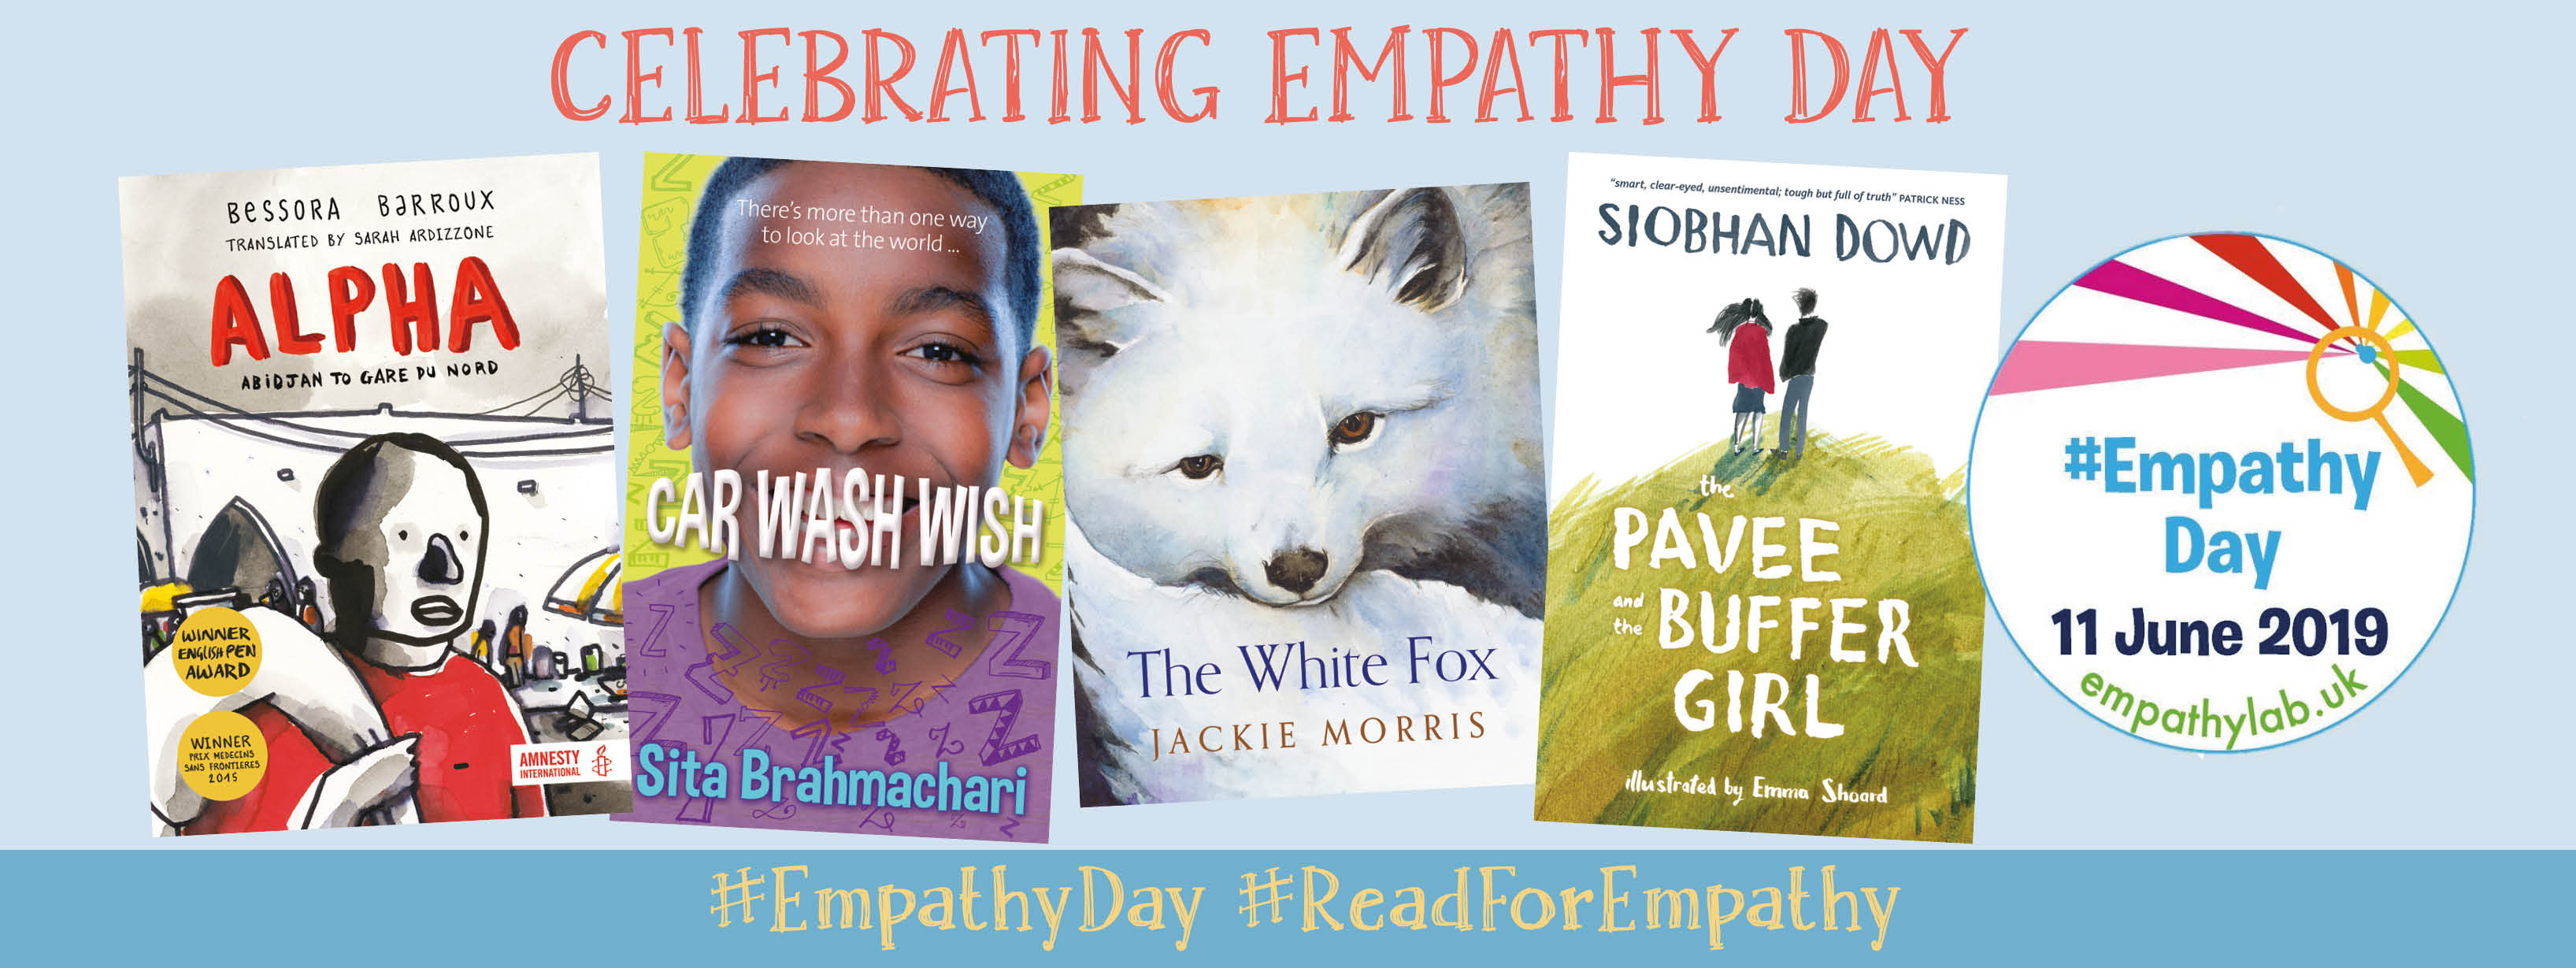 Empathy Day 2019